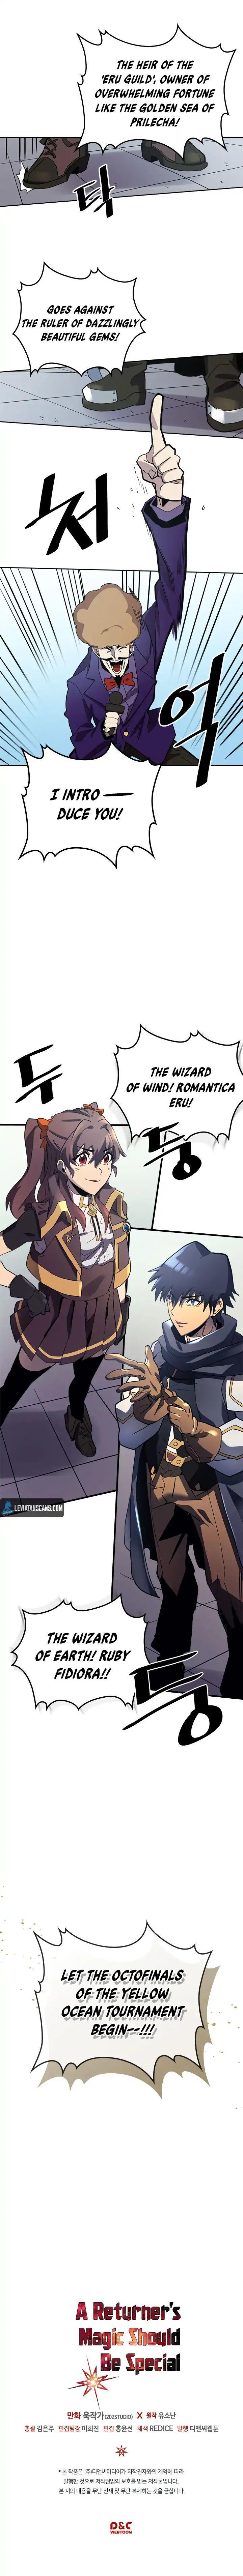 A Returner's Magic Should Be Special Chapter 77 page 9 - Mangakakalots.com